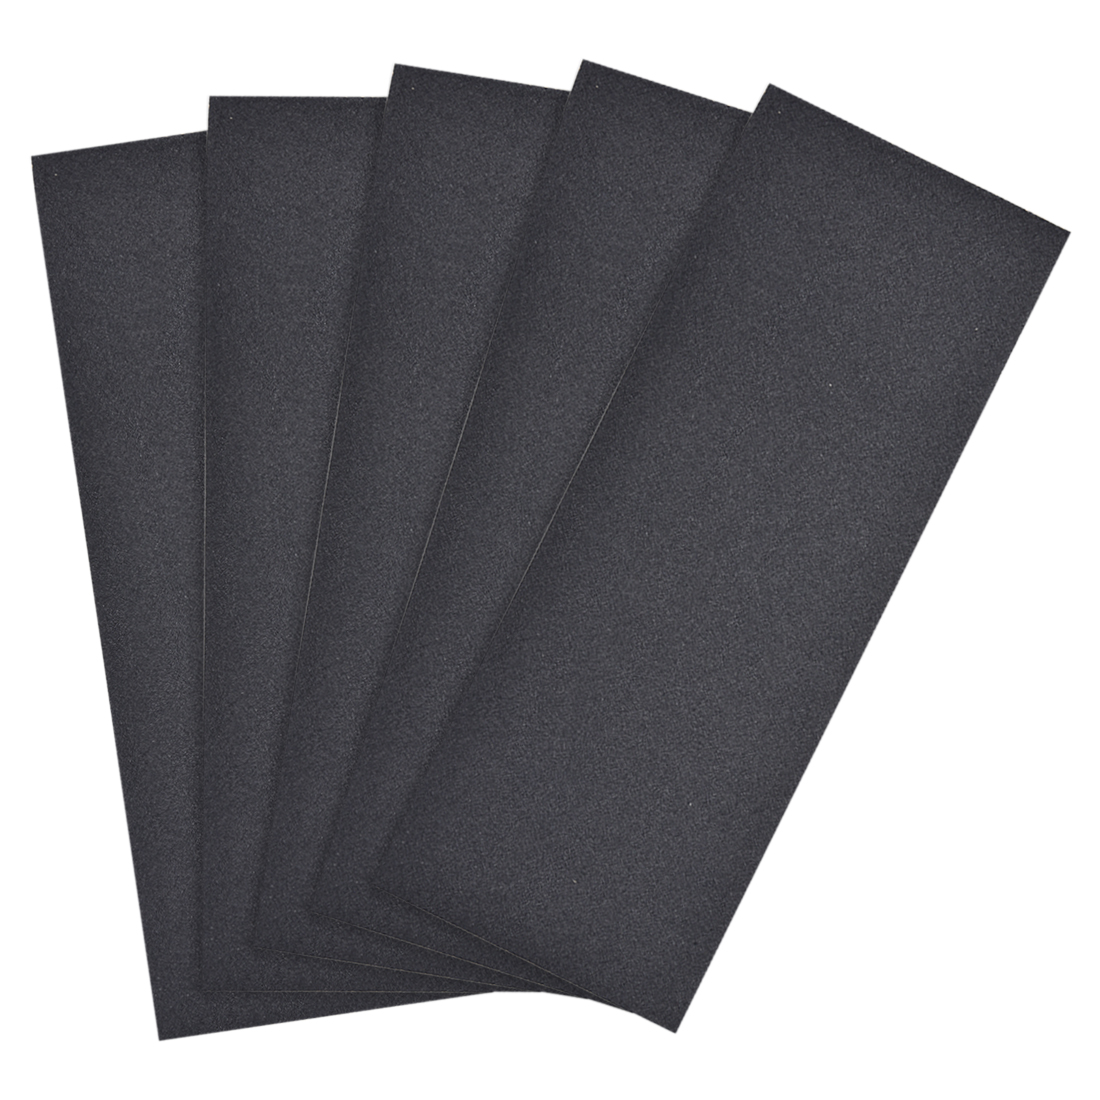 Waterproof Sandpaper, Wet Dry Sand Paper Grit of 220, 9 x 3.7inch 5pcs